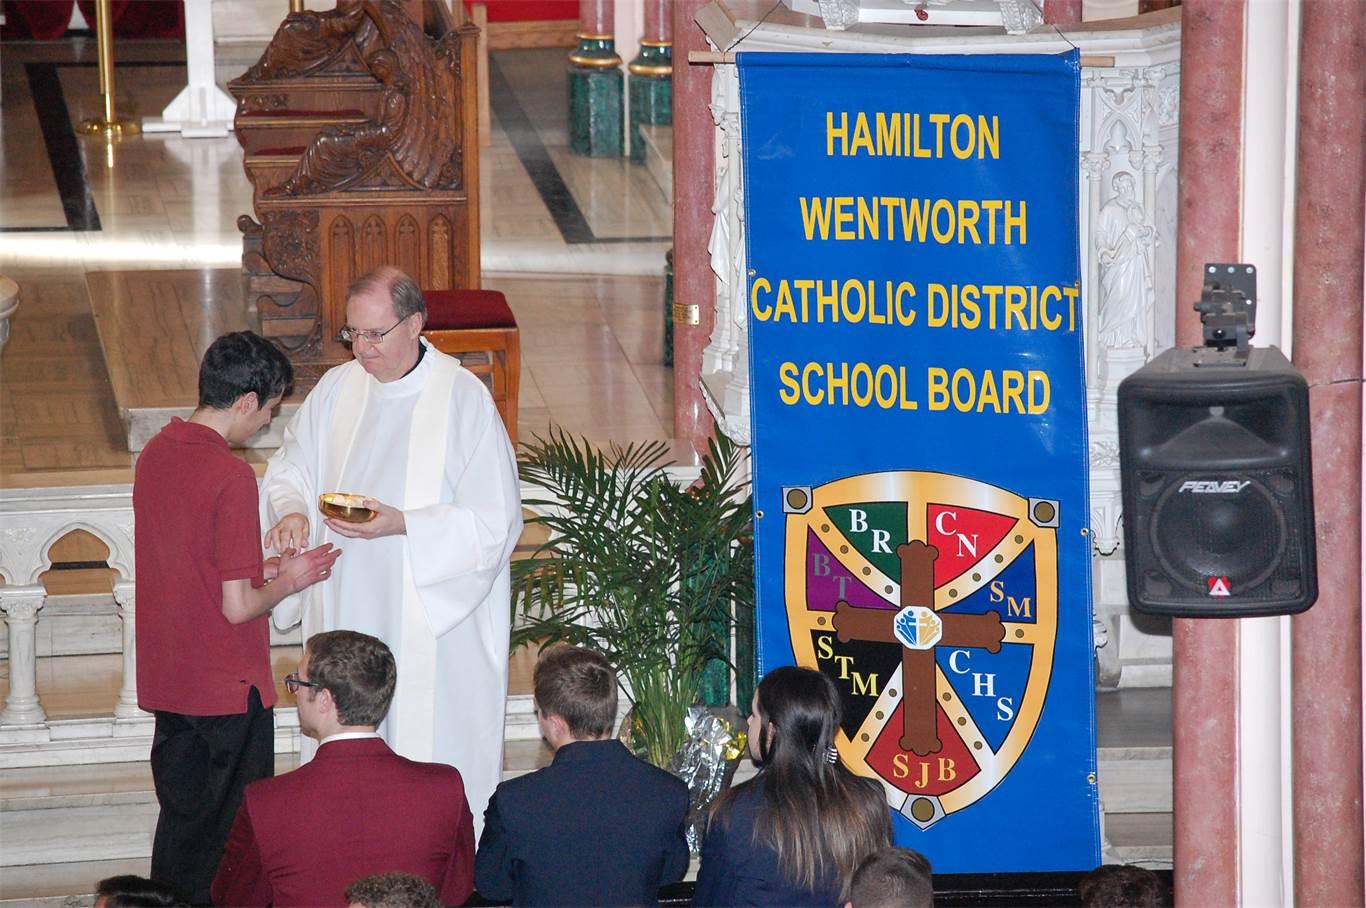 Hamilton Wentworth Catholic District Schoolboard